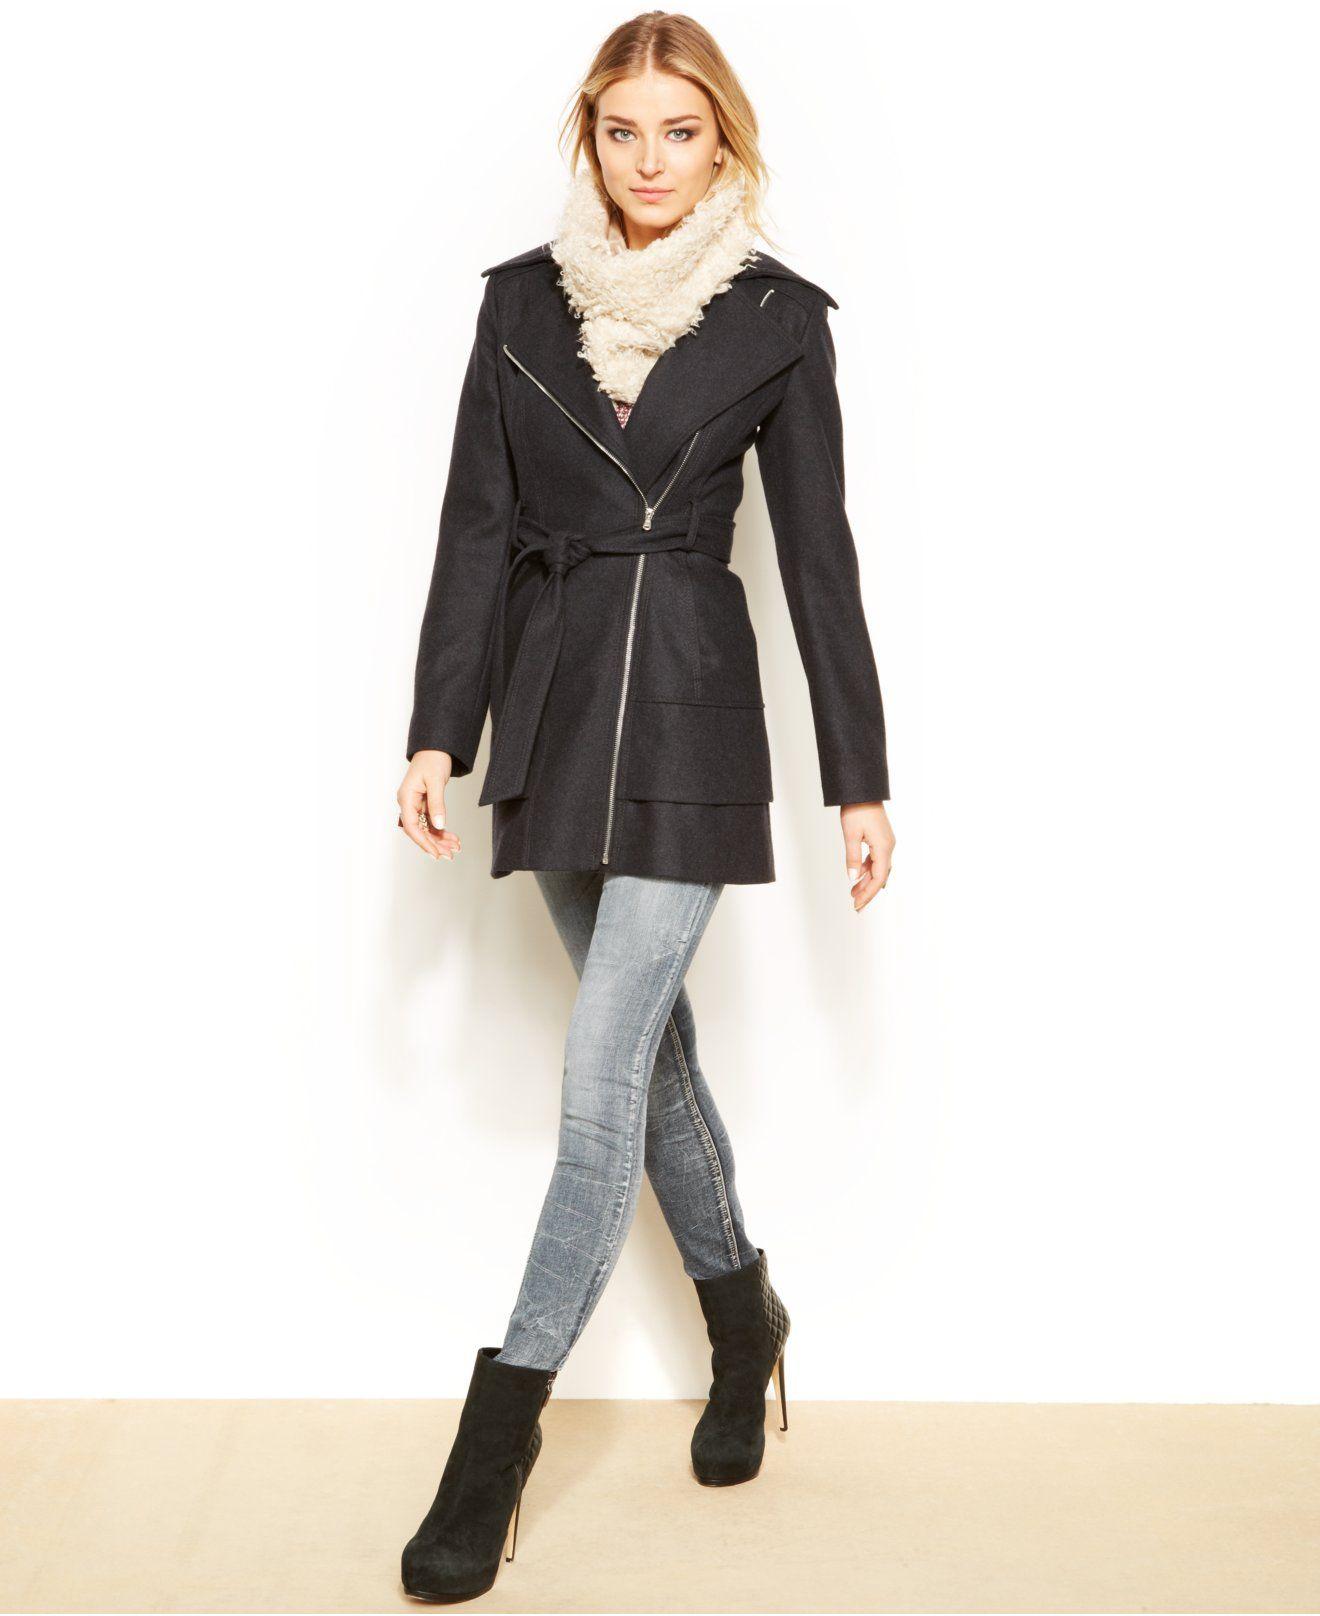 ff7e7e47a8fd0 GUESS Asymmetrical Tiered Hem Belted Wool Coat - Coats - Women - Macy s  109